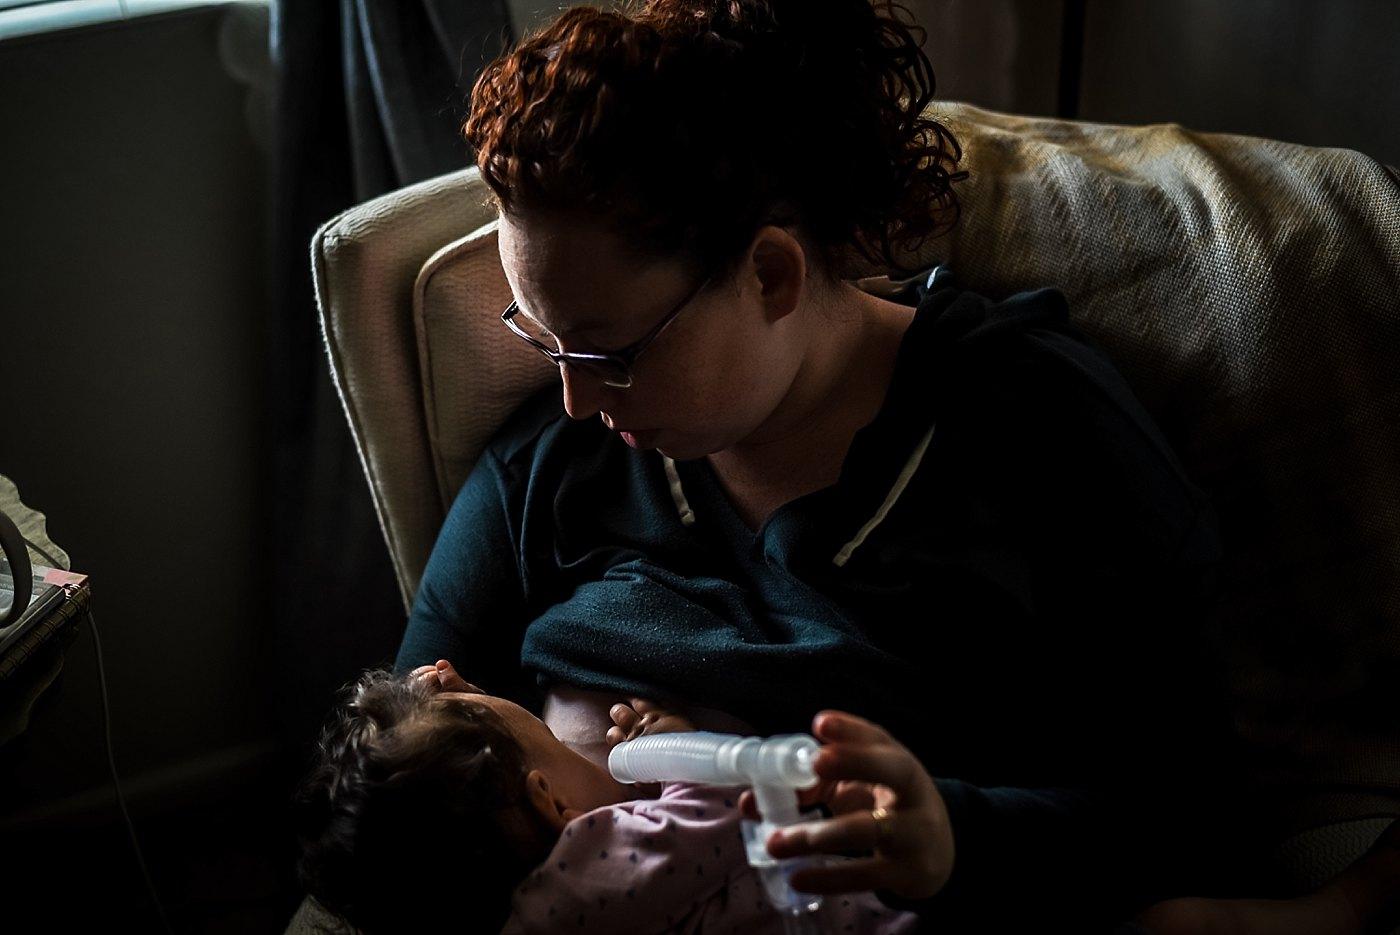 mom giving toddler girl breathing treatment yucaipa redlands family photograper